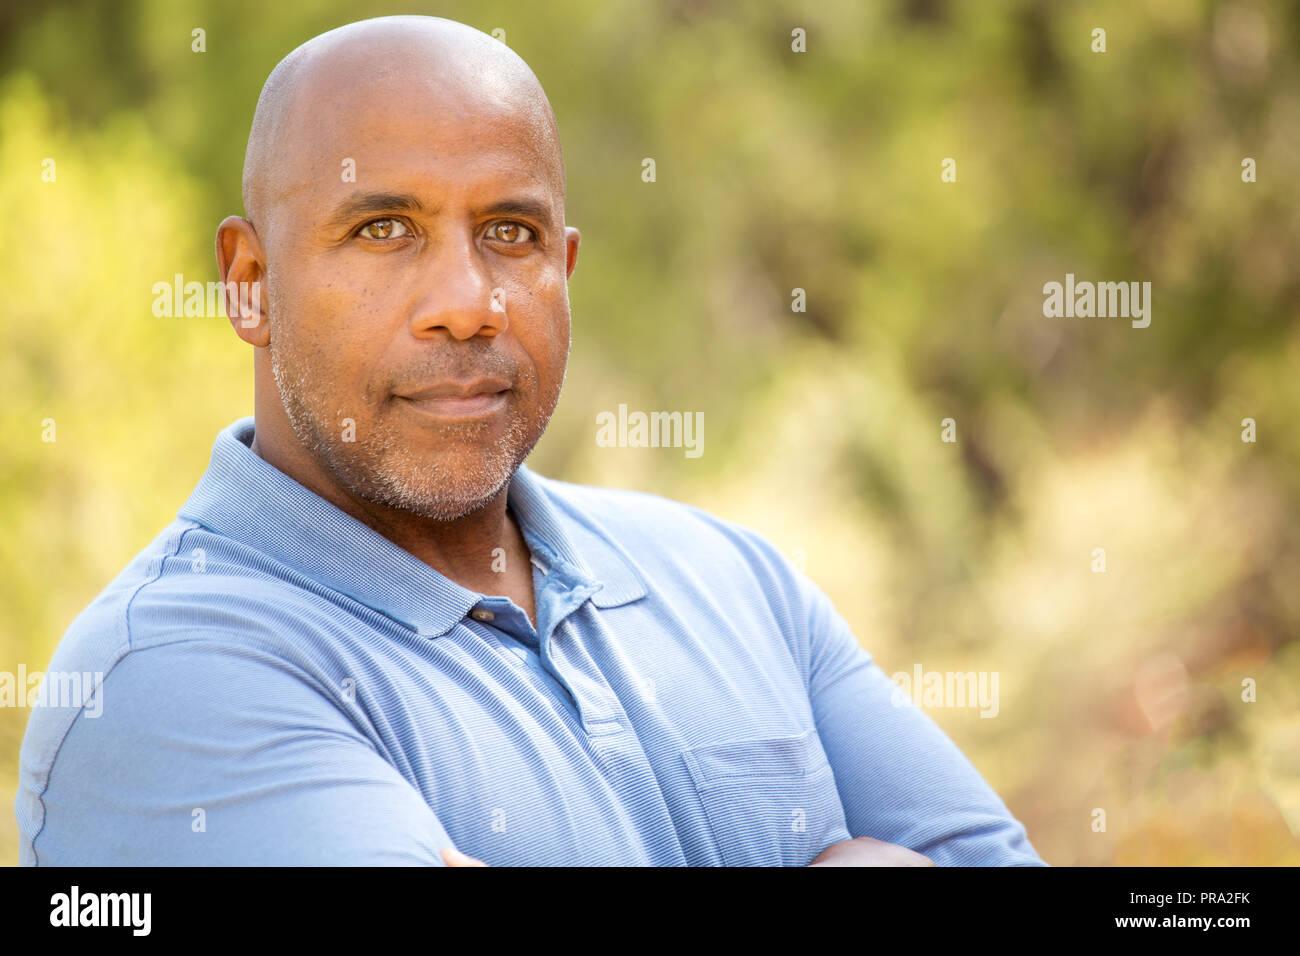 Mature hombre afroamericano. Imagen De Stock